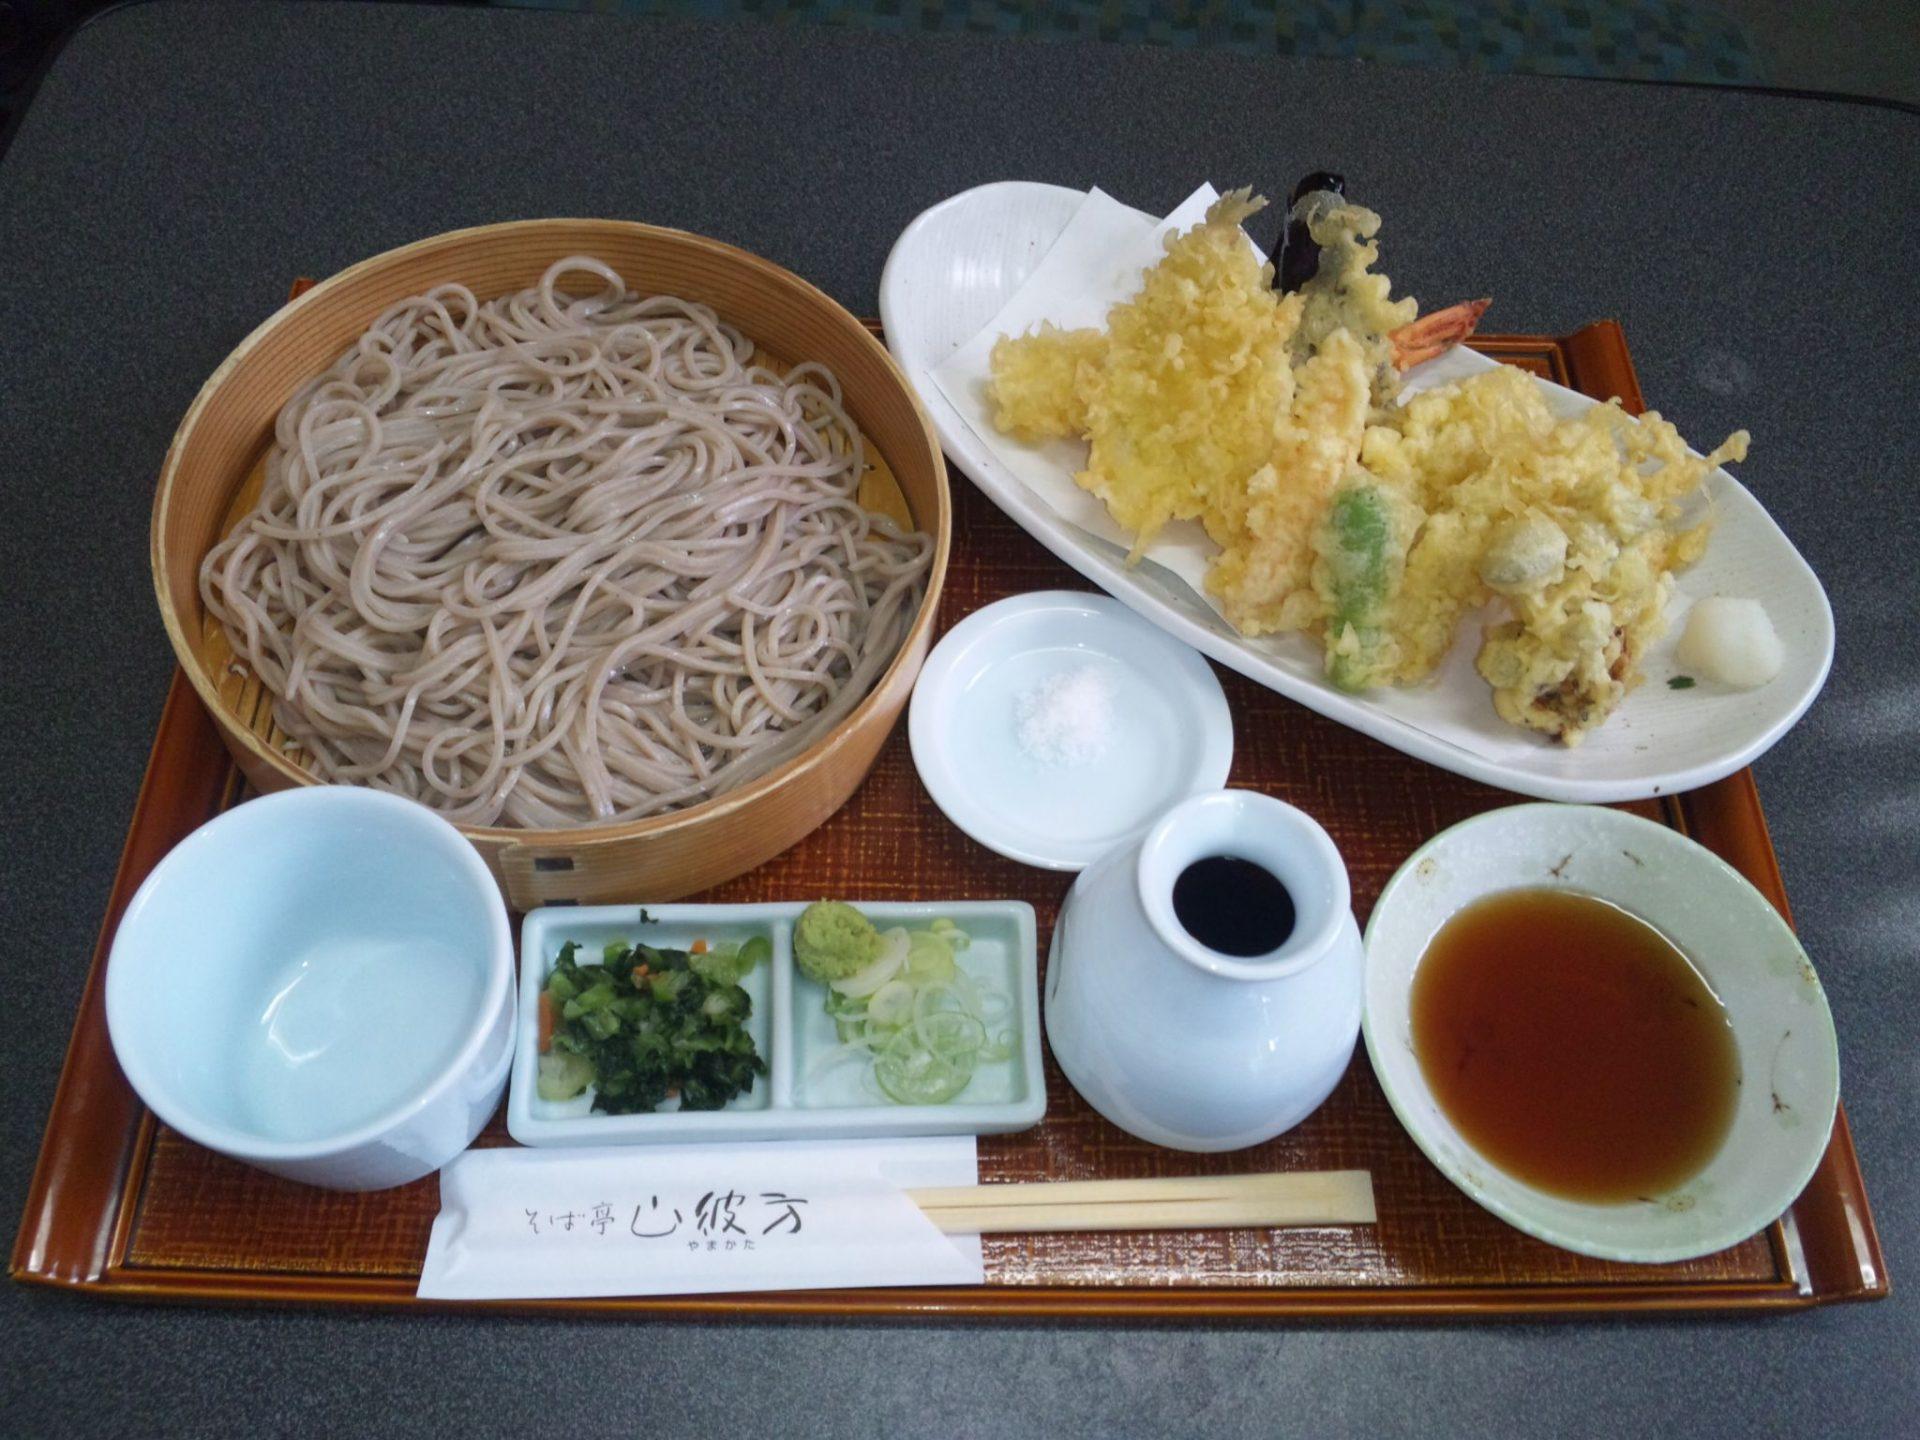 蕎麥亭 山彼方(Yamakata)